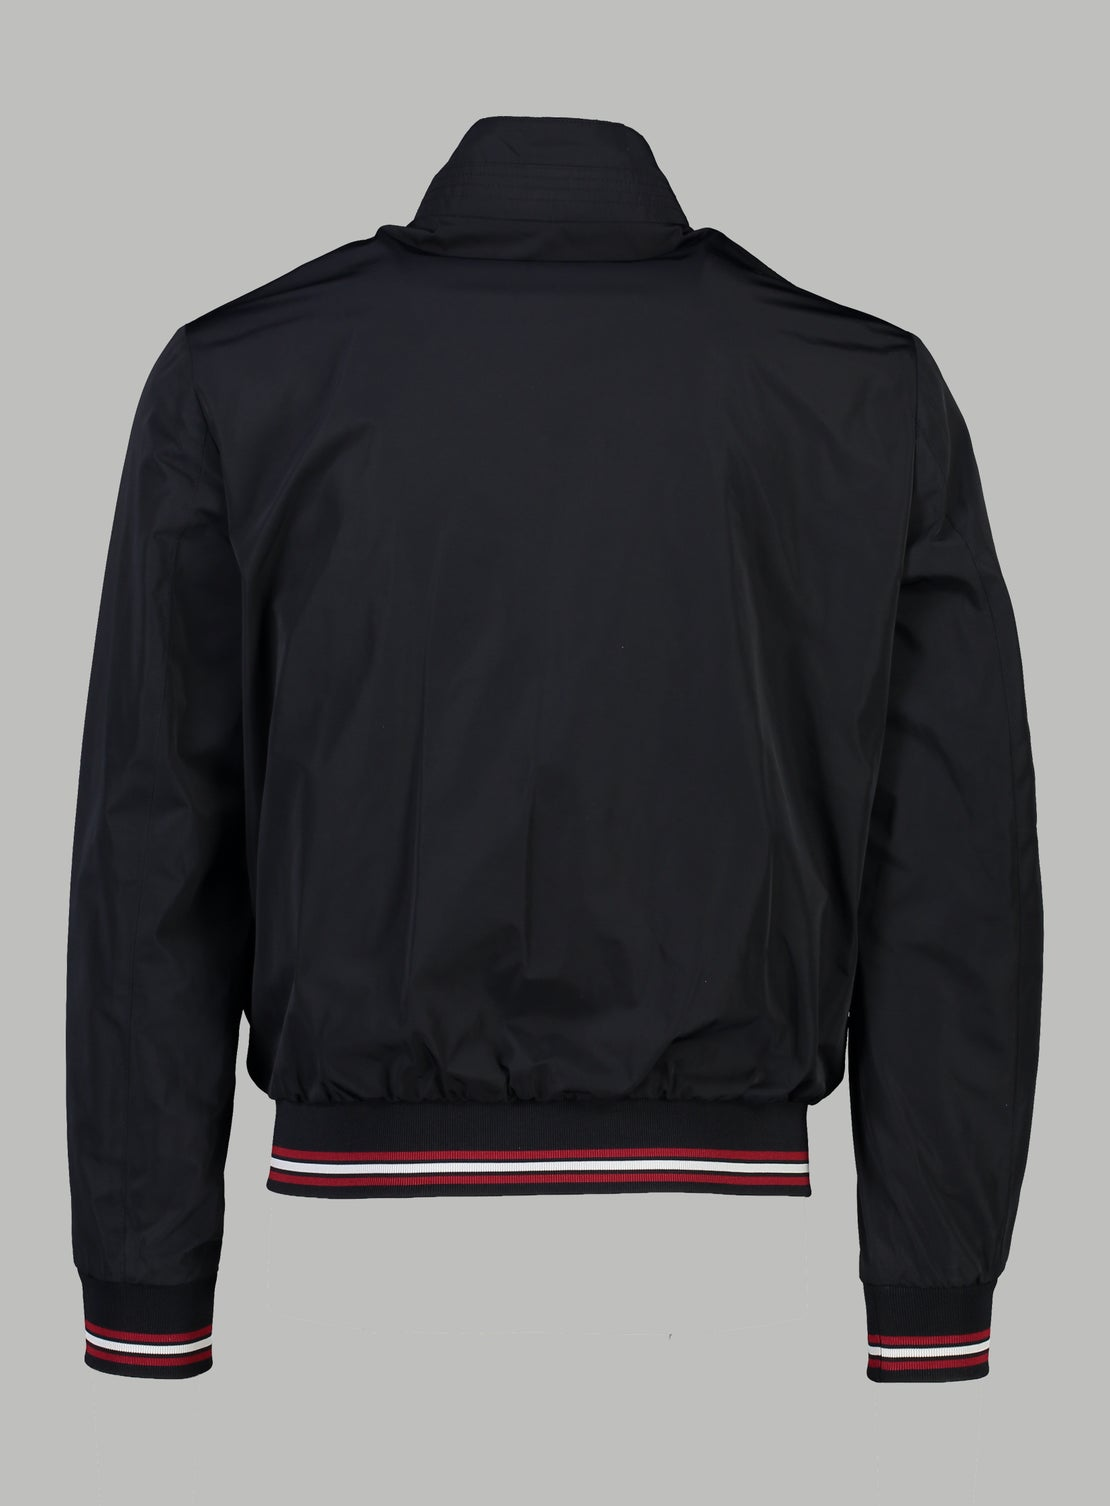 Gil Red Trim Bomber Jacket